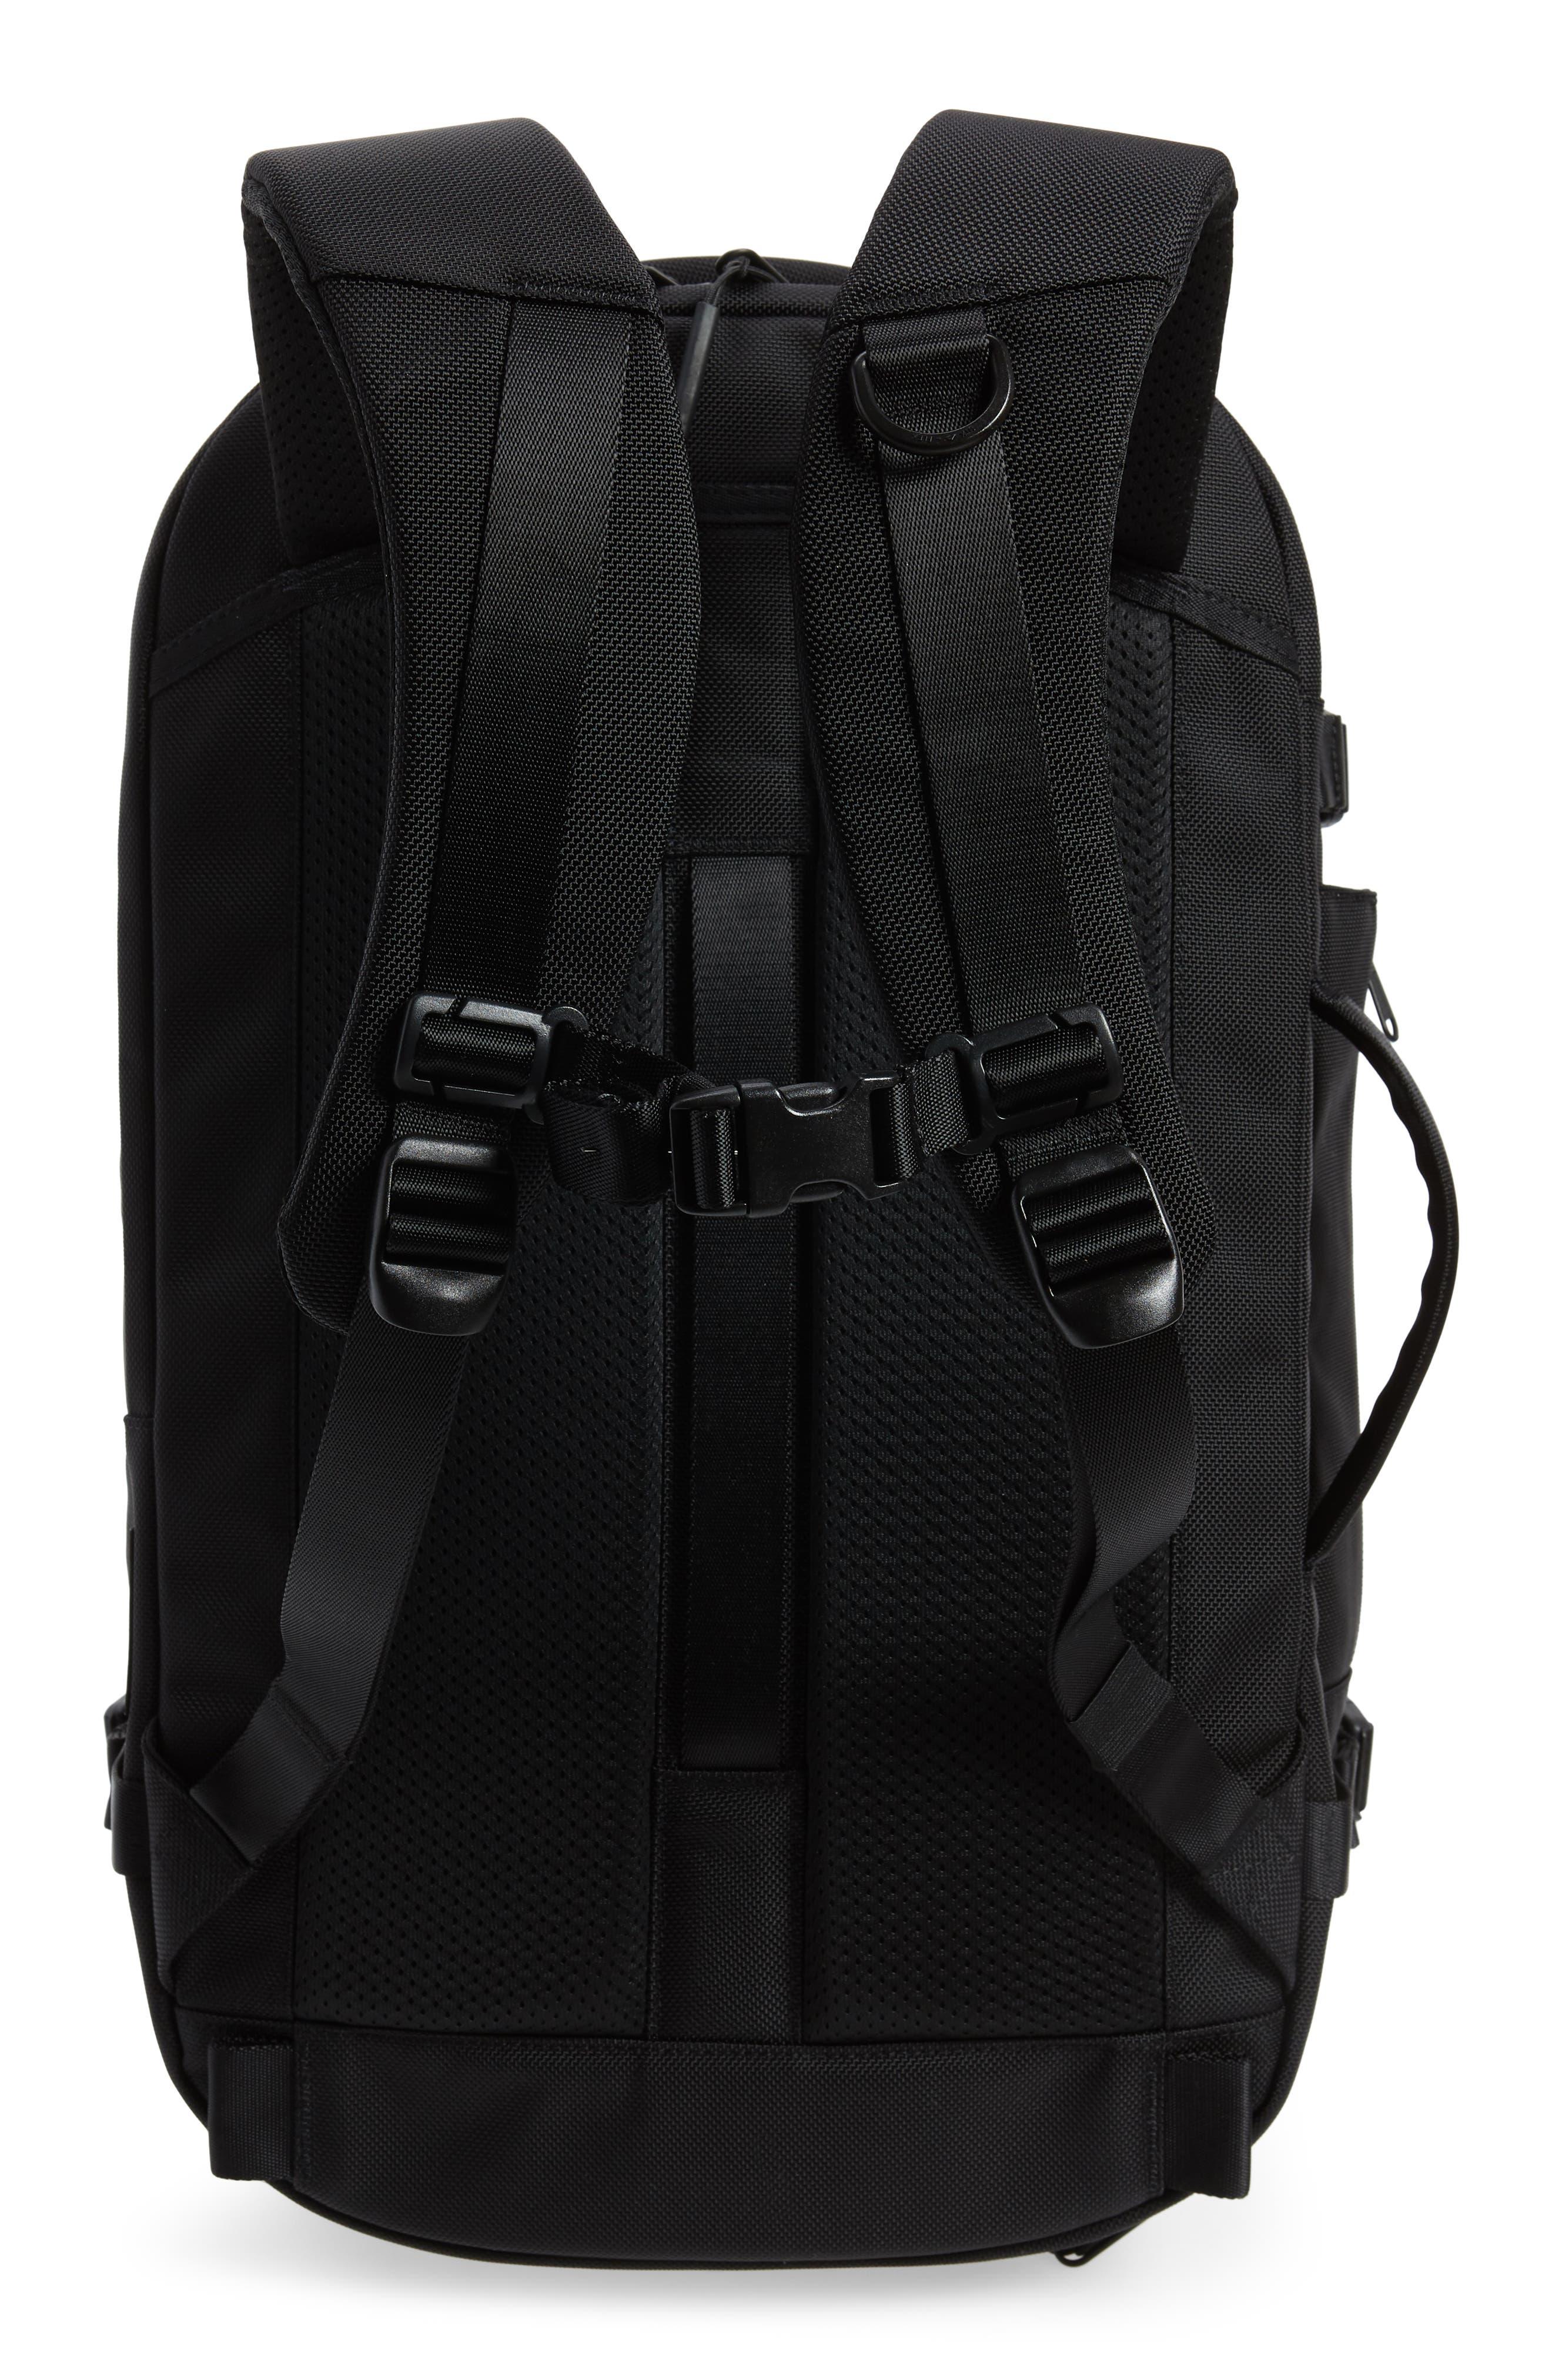 Travel Pack 2 Backpack,                             Alternate thumbnail 3, color,                             BLACK